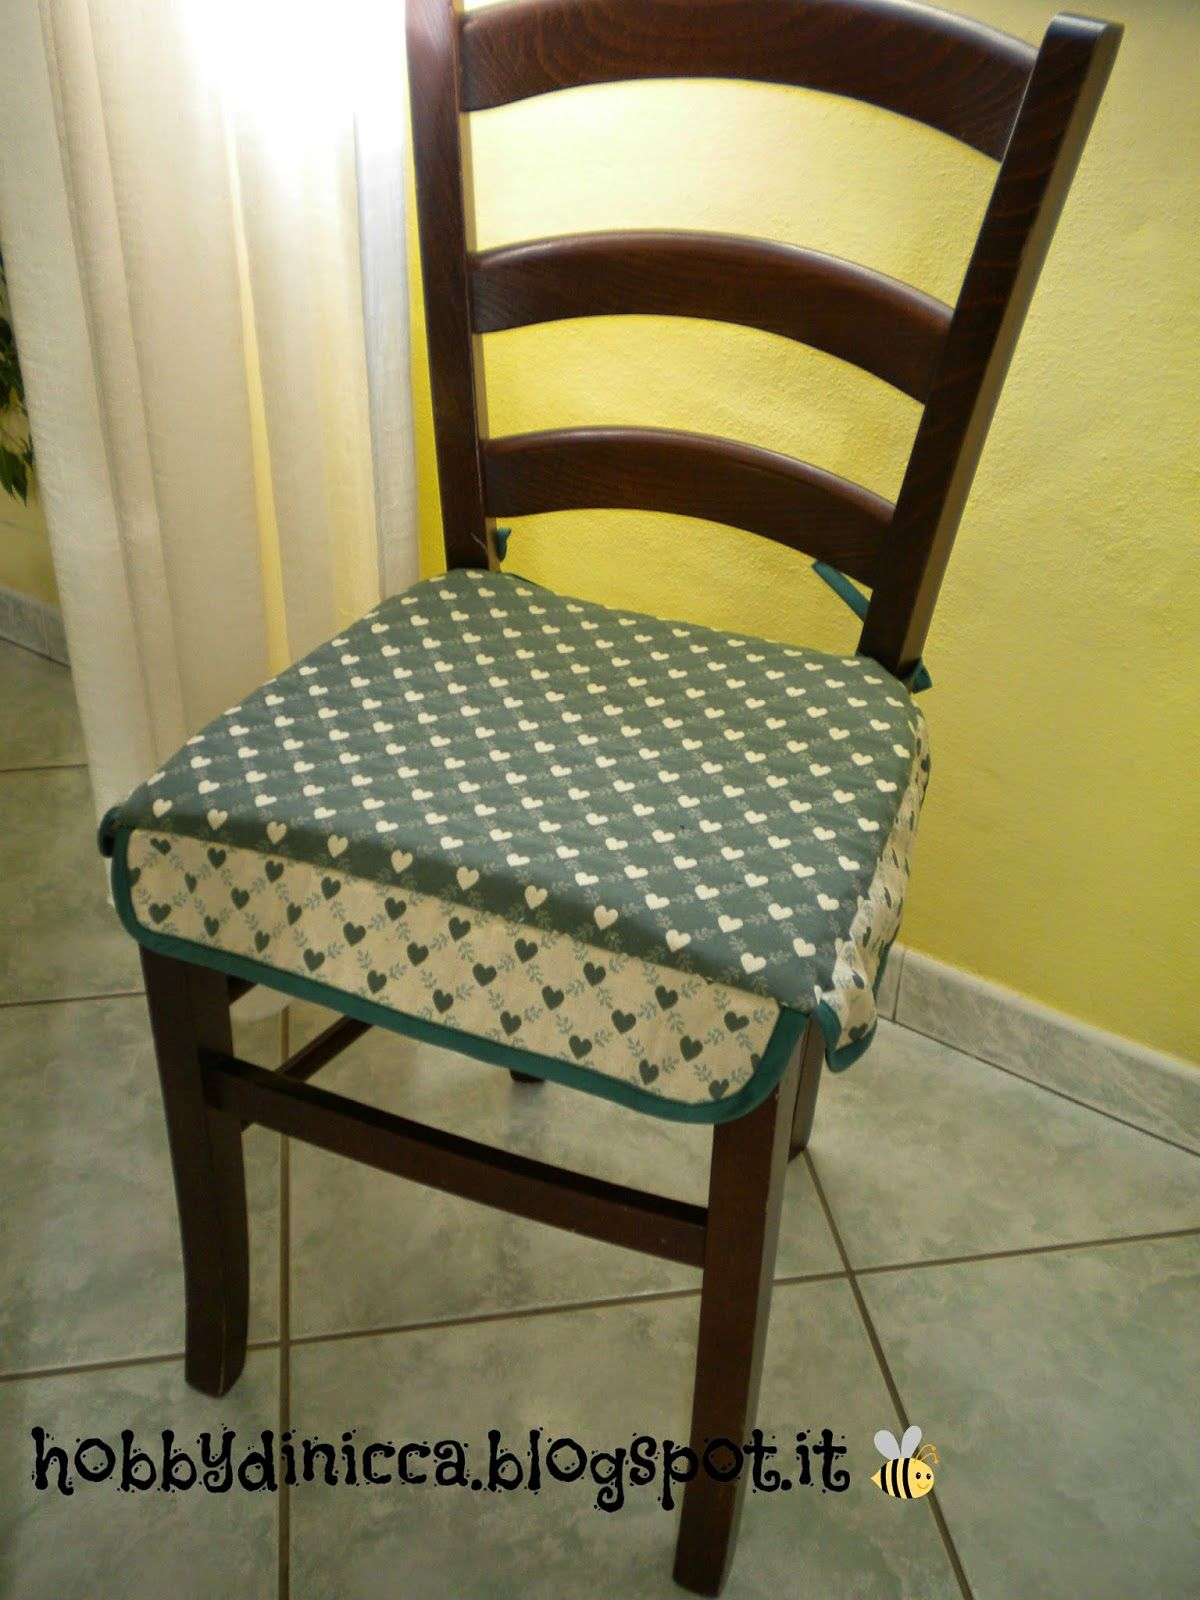 hobby di Nicca: Cuscino per sedie Tutorial | Hobby | Pinterest ...